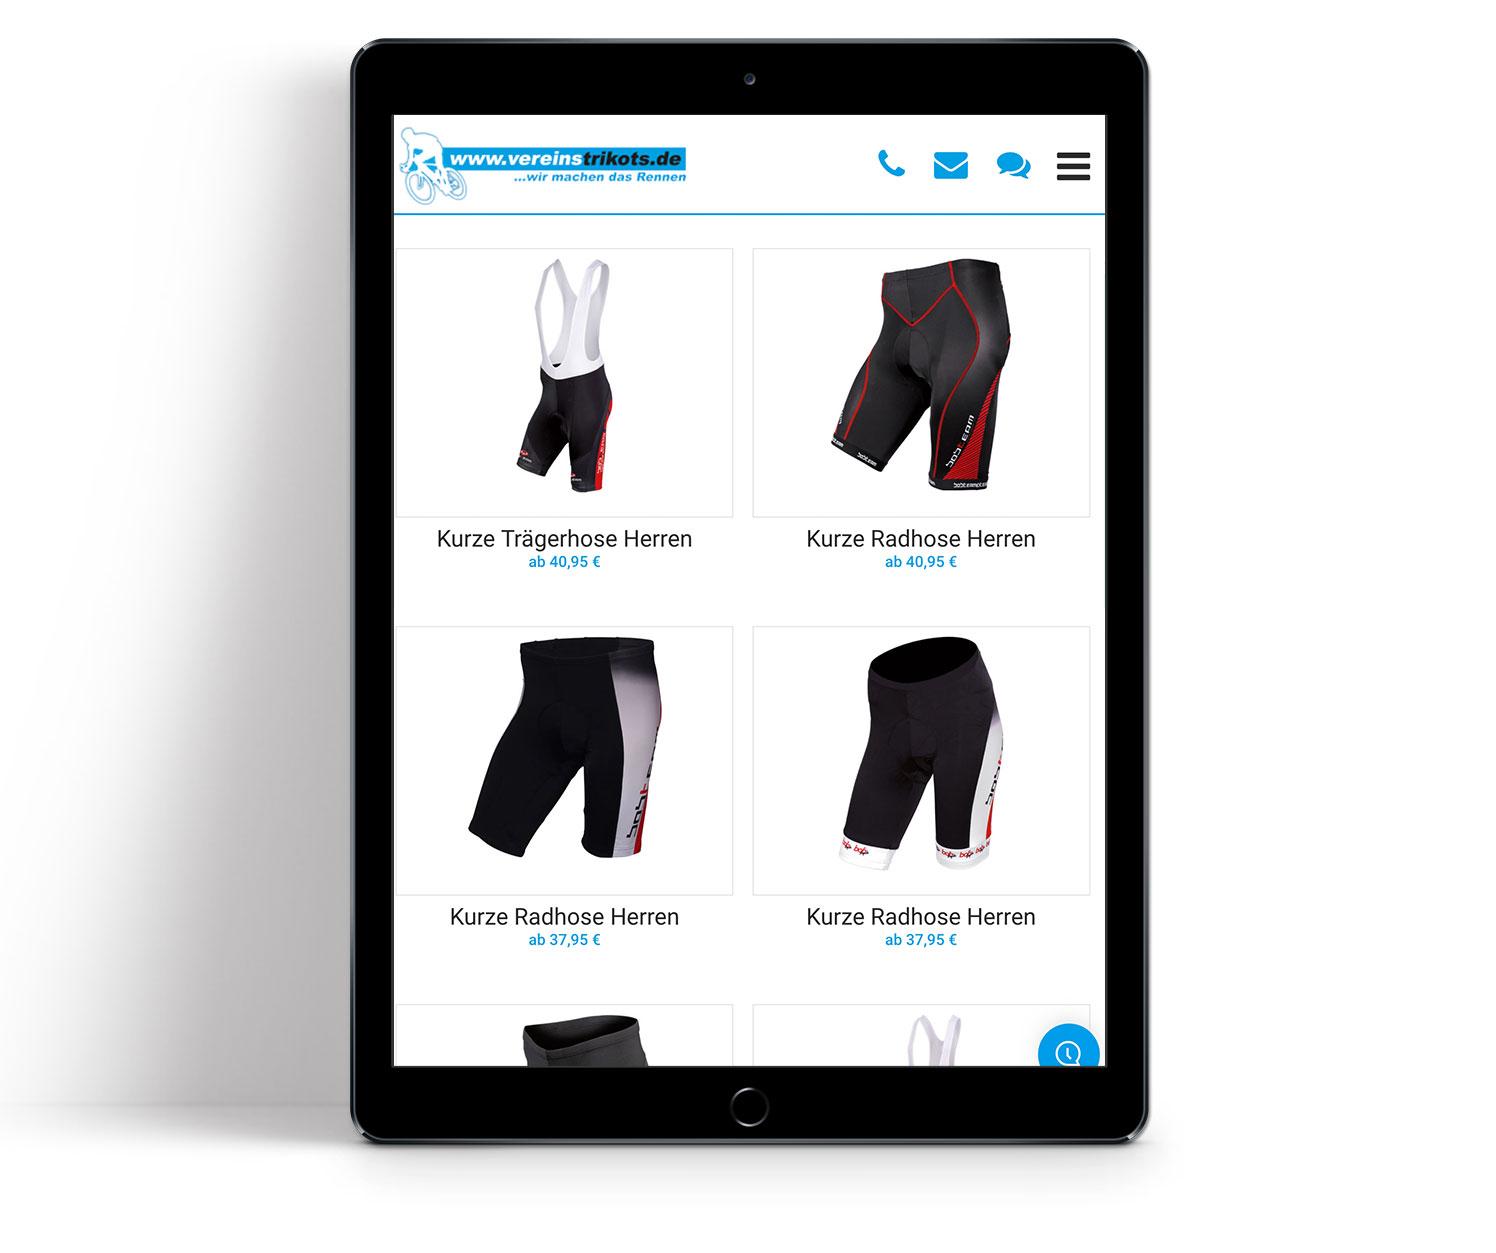 P12 Werbeagentur Heidelberg Referenz-Website-Vereinstrikots Shop tablet01 mobile